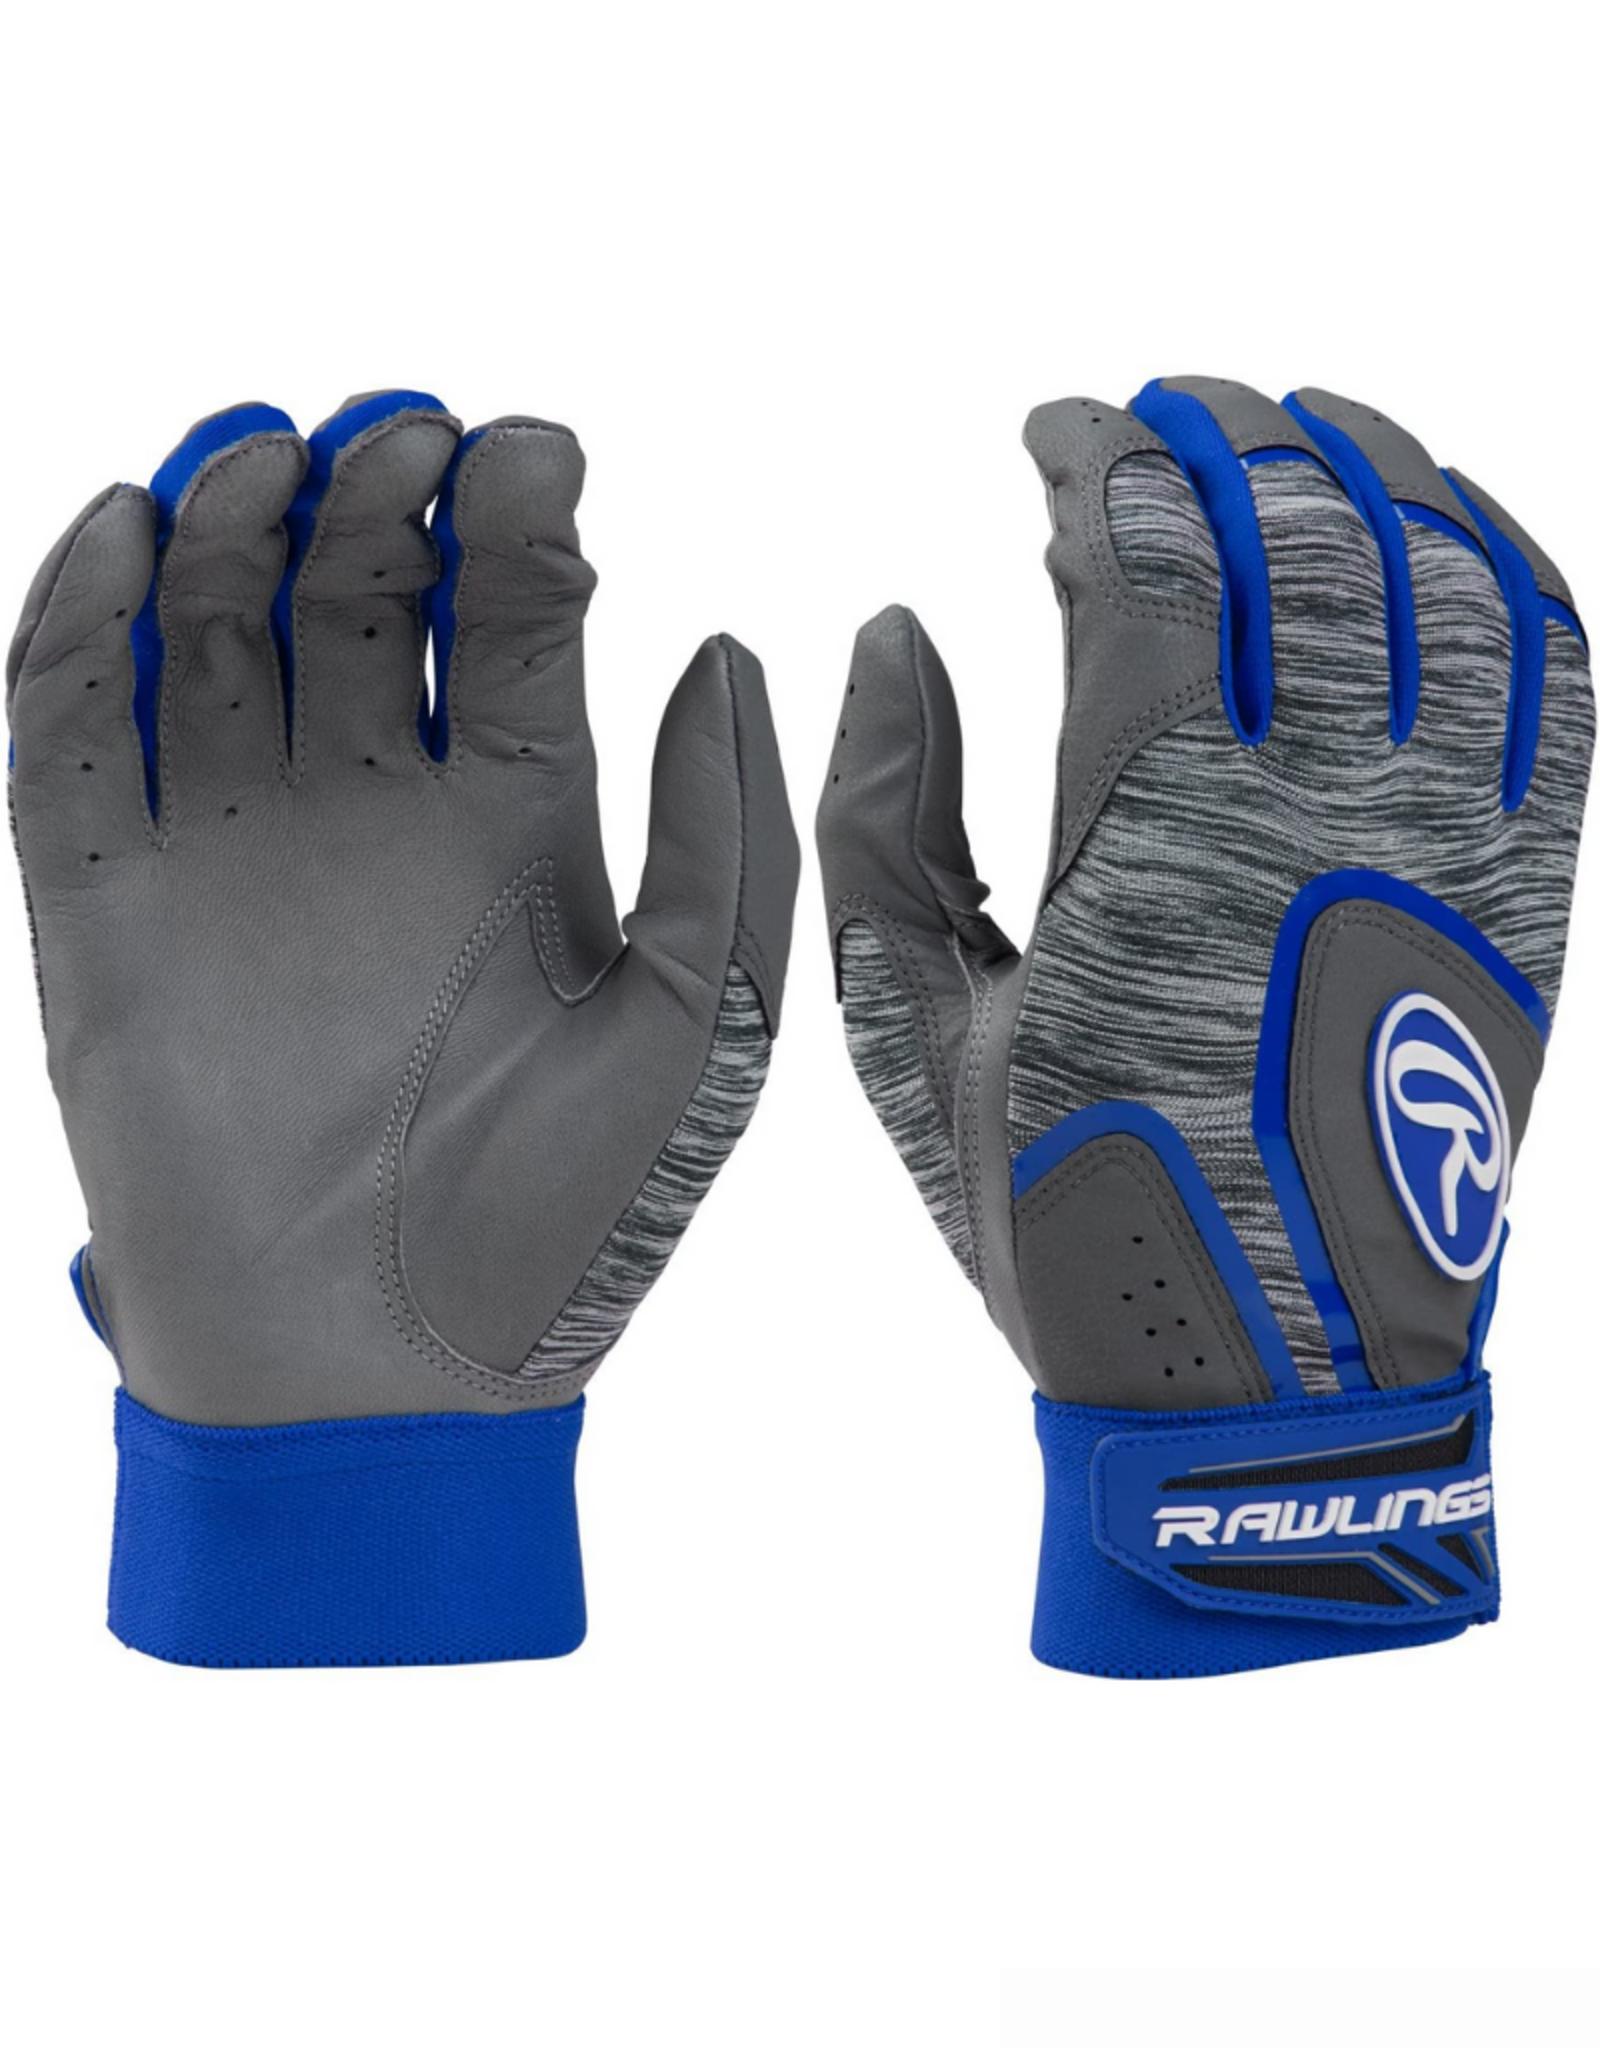 Rawlings Men's 5150 Batting Gloves Grey/Blue